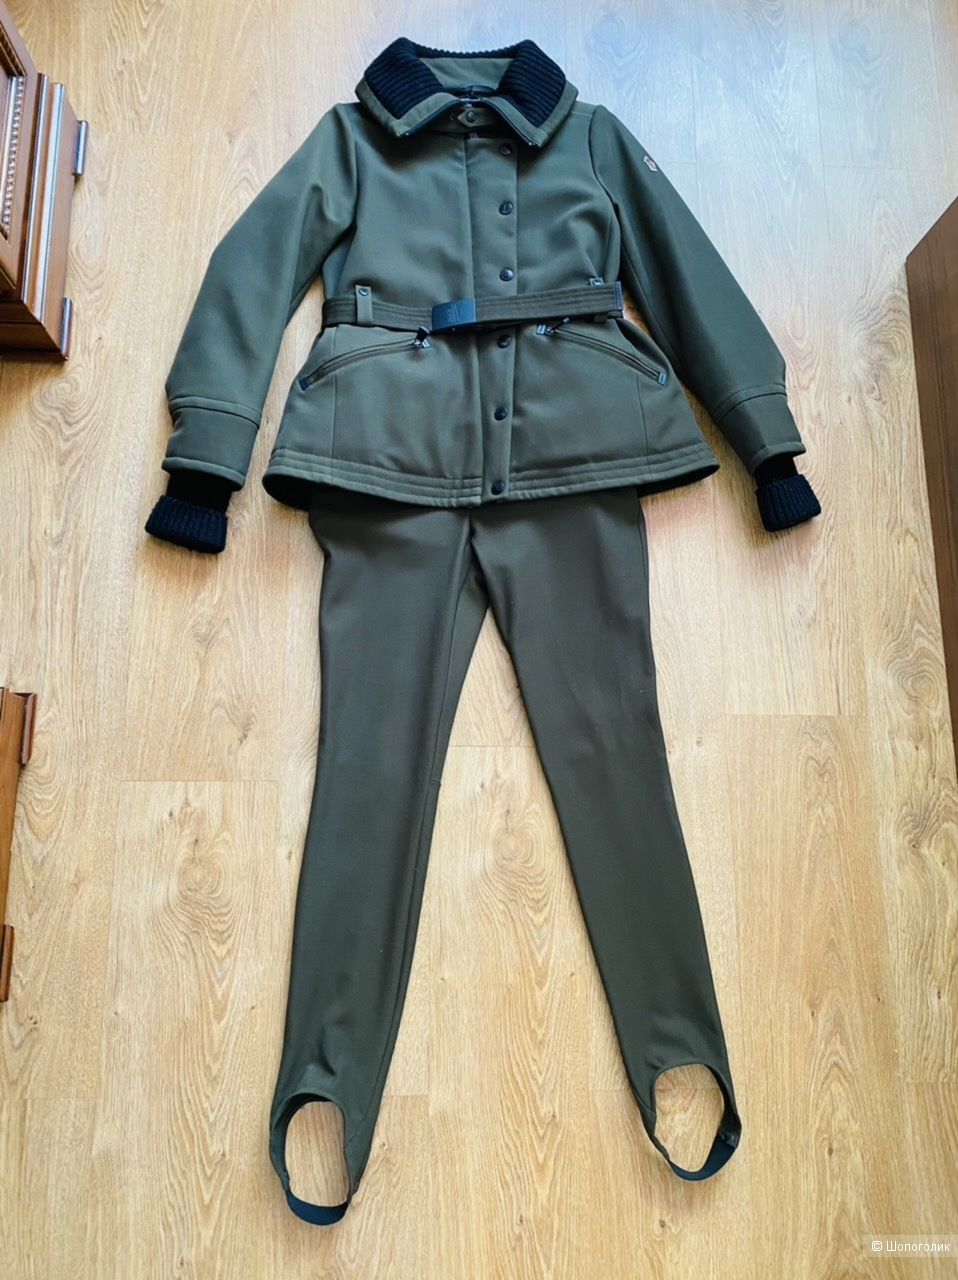 Горнолыжный костюм Moncler, размер 1